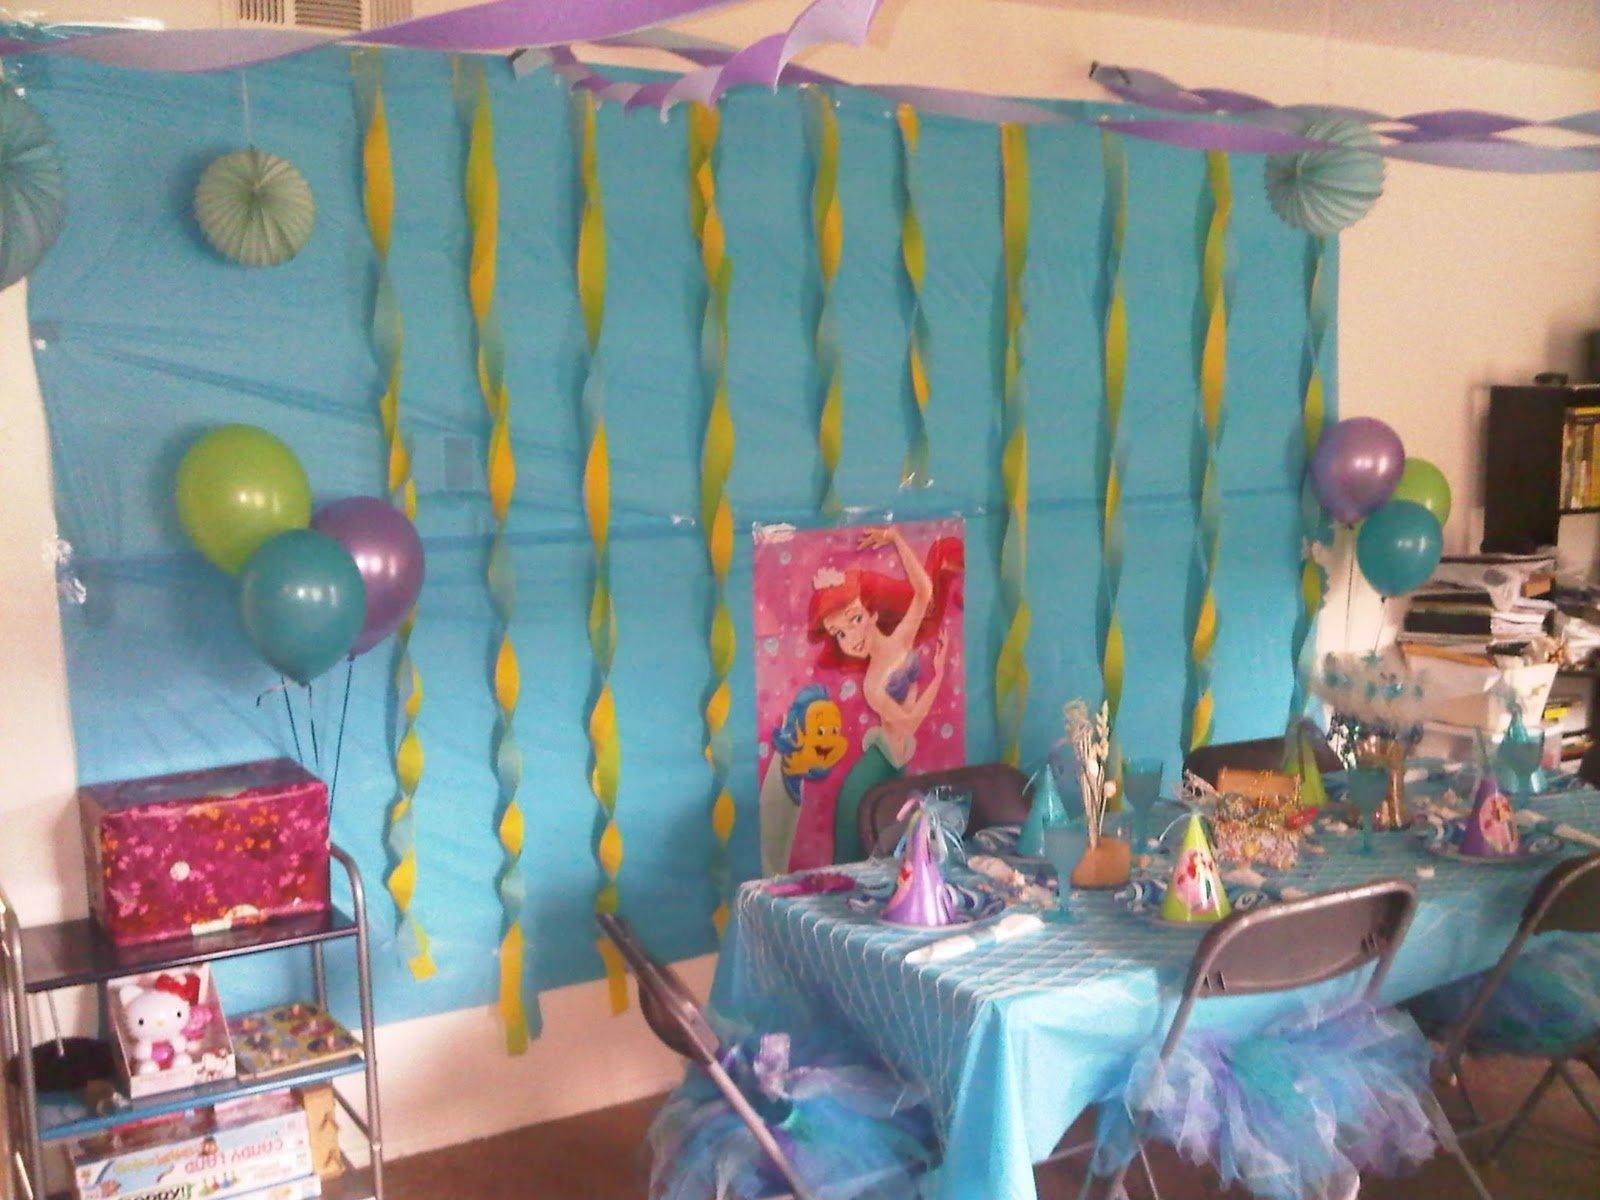 10 Pretty Little Mermaid Birthday Party Ideas little mermaid birthday party decorations little mermaid 1 2021